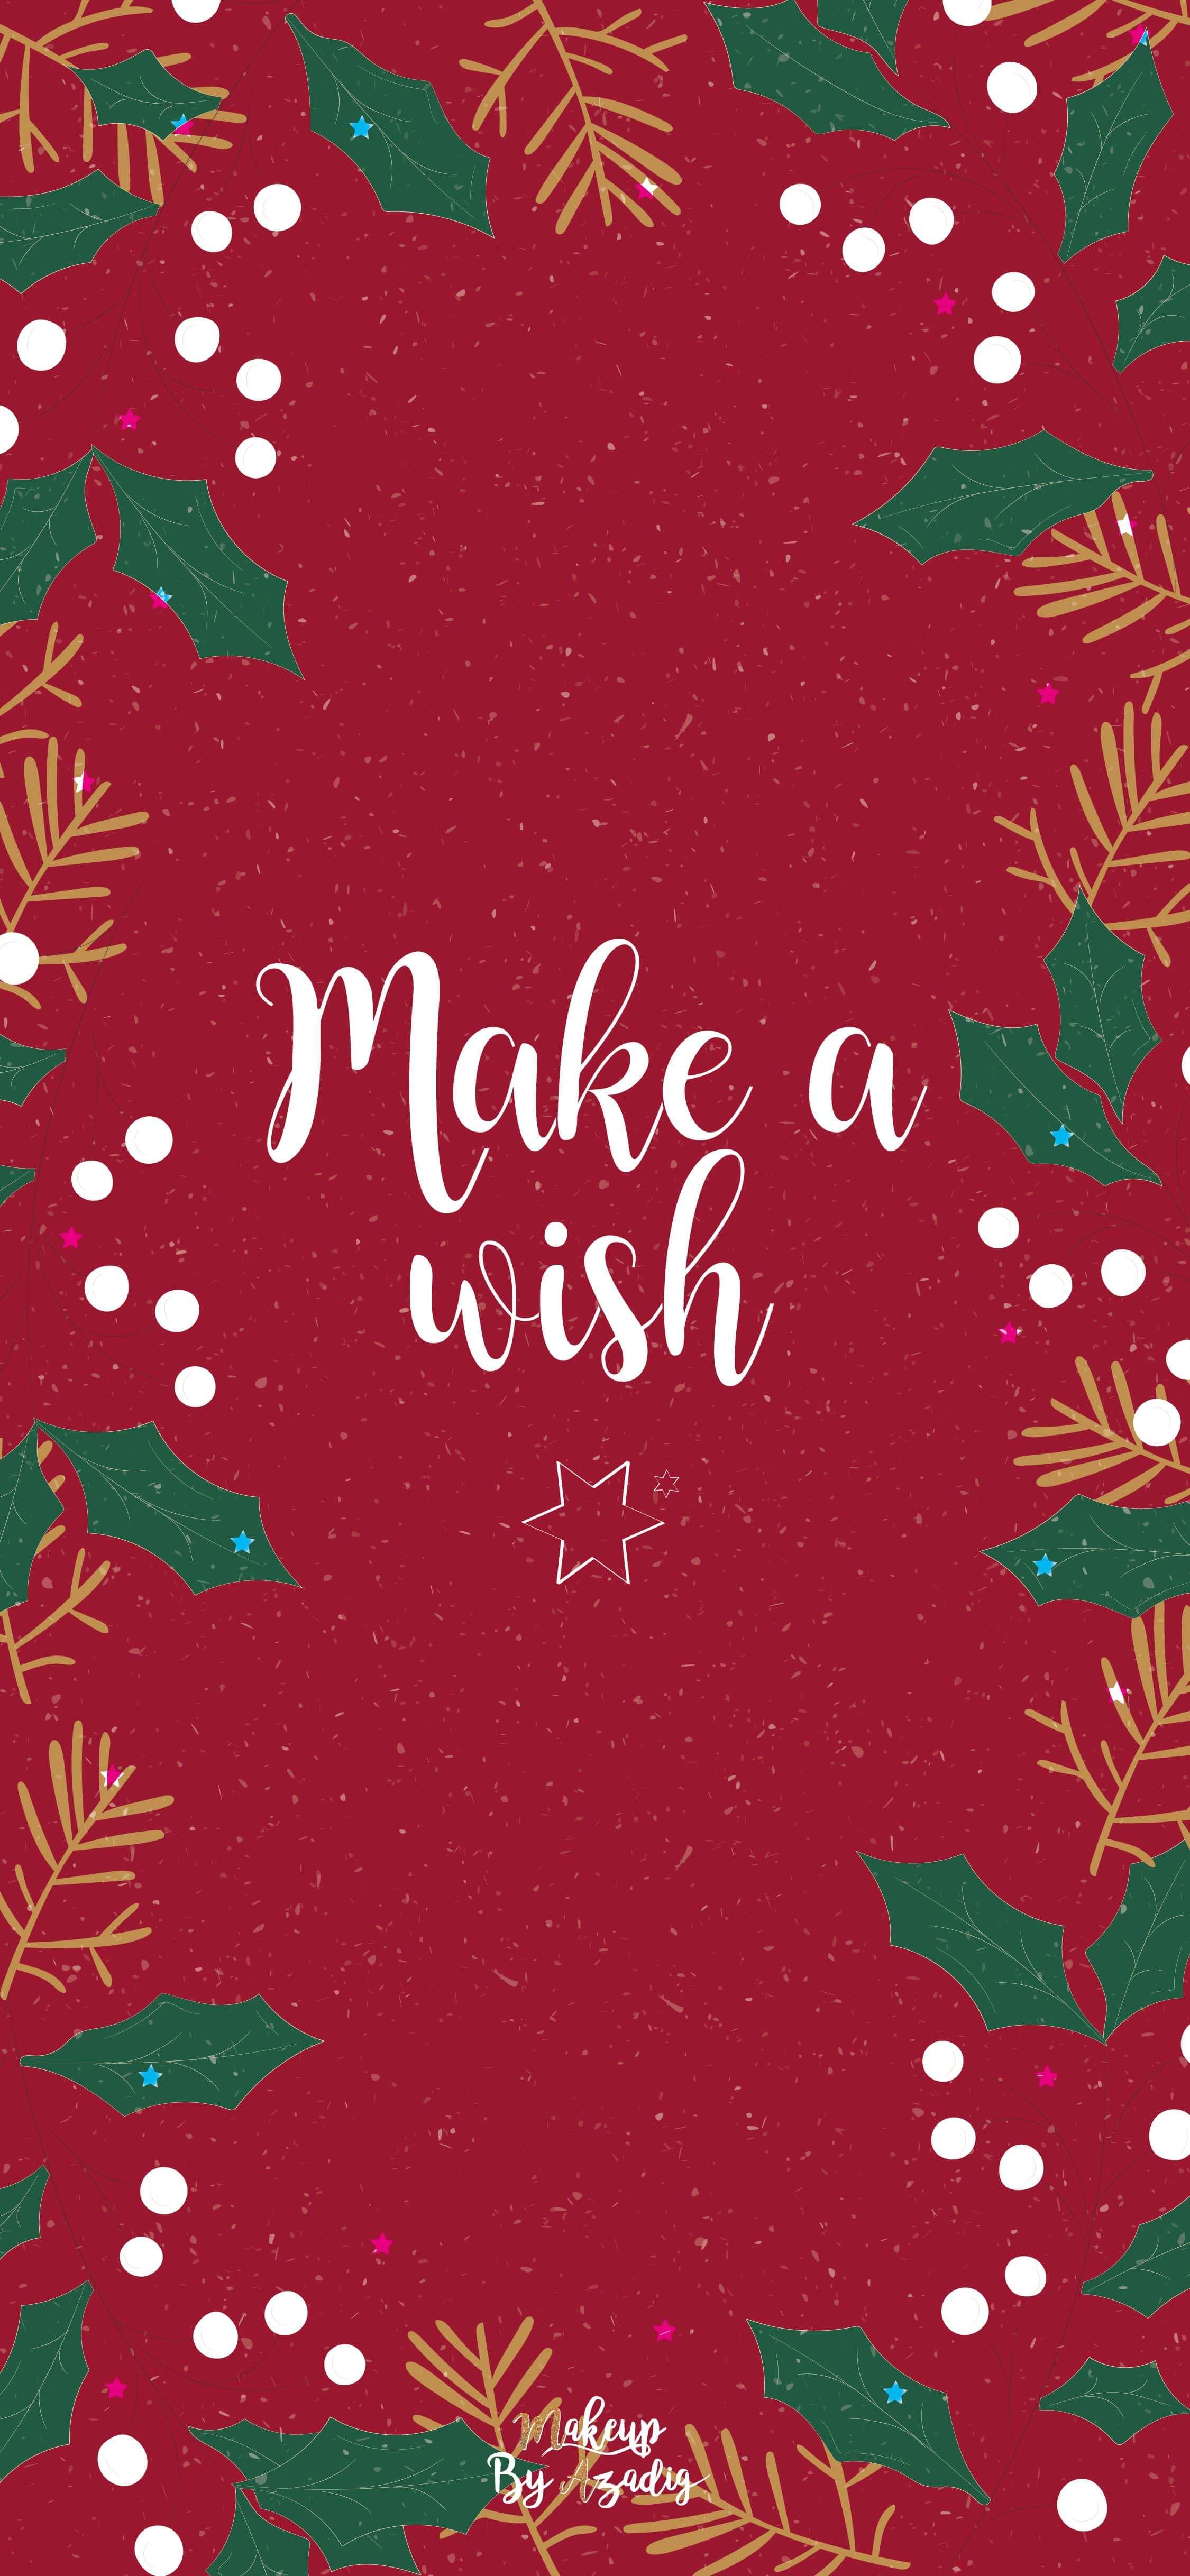 fond-decran-wallpaper-christmas-noel-make-a-wish-iphone-samsung-huawai-makeupbyazadig-tendance